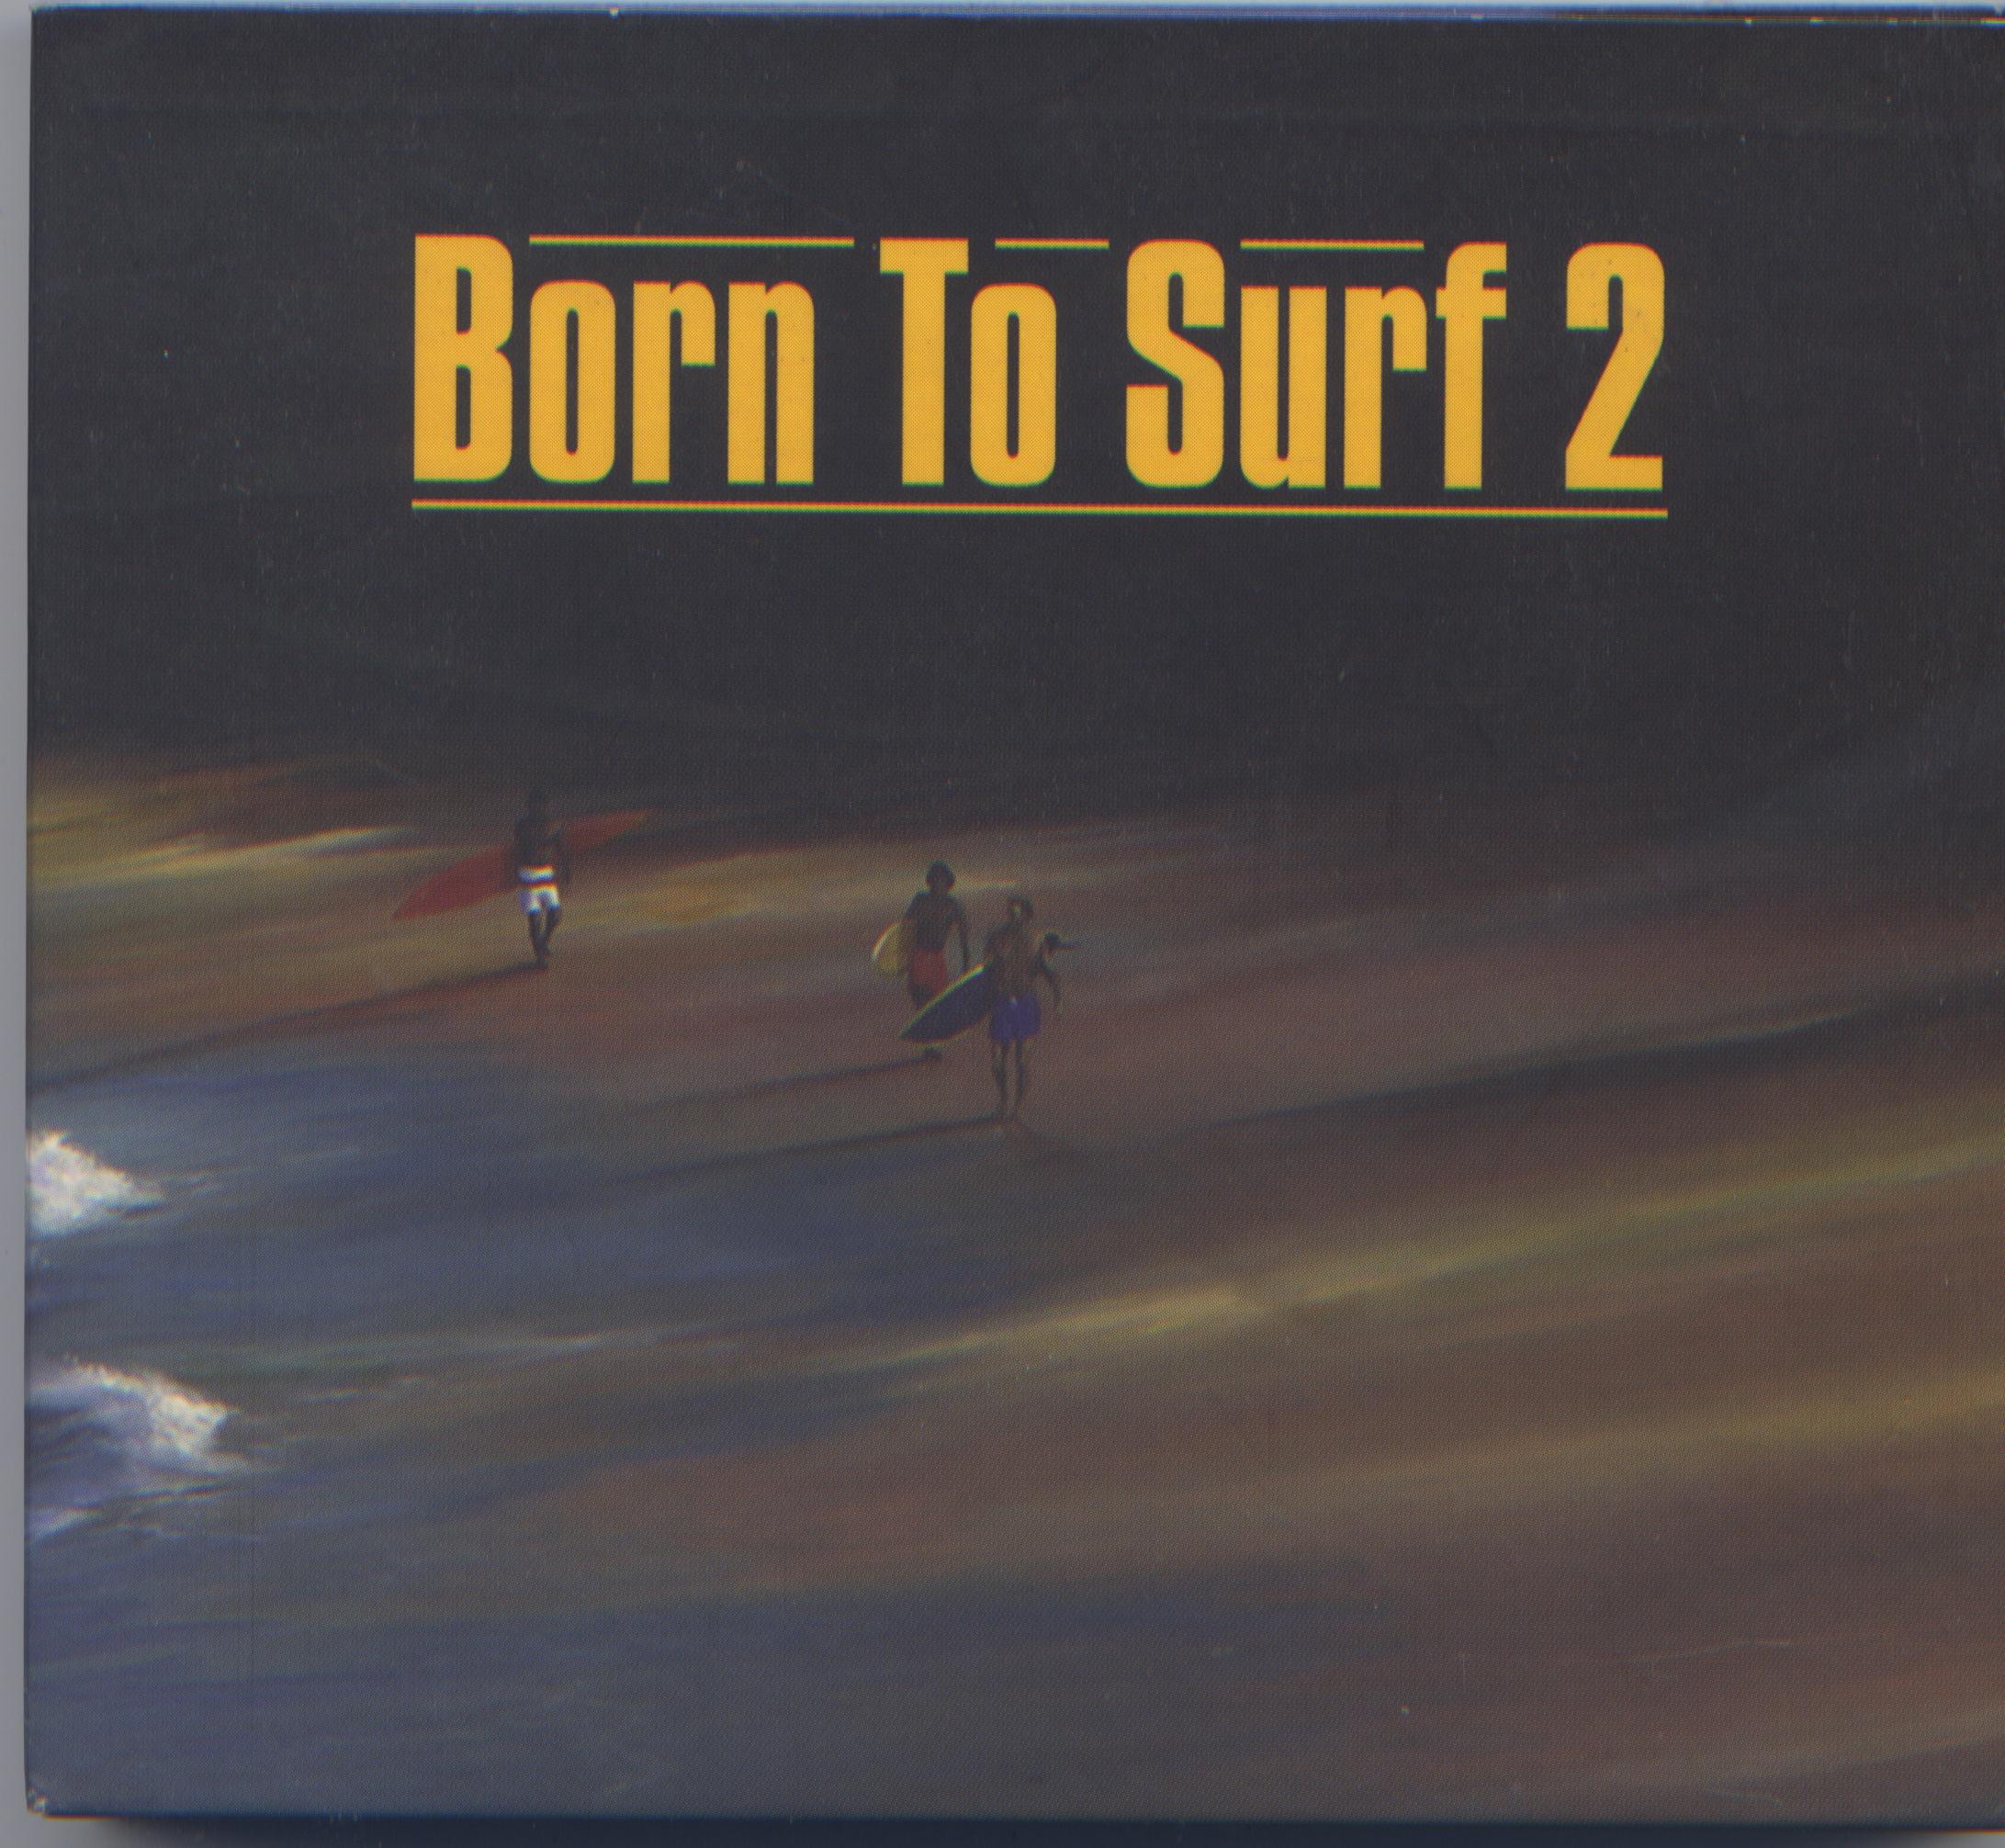 BORN TO SURF 2  CD.jpeg